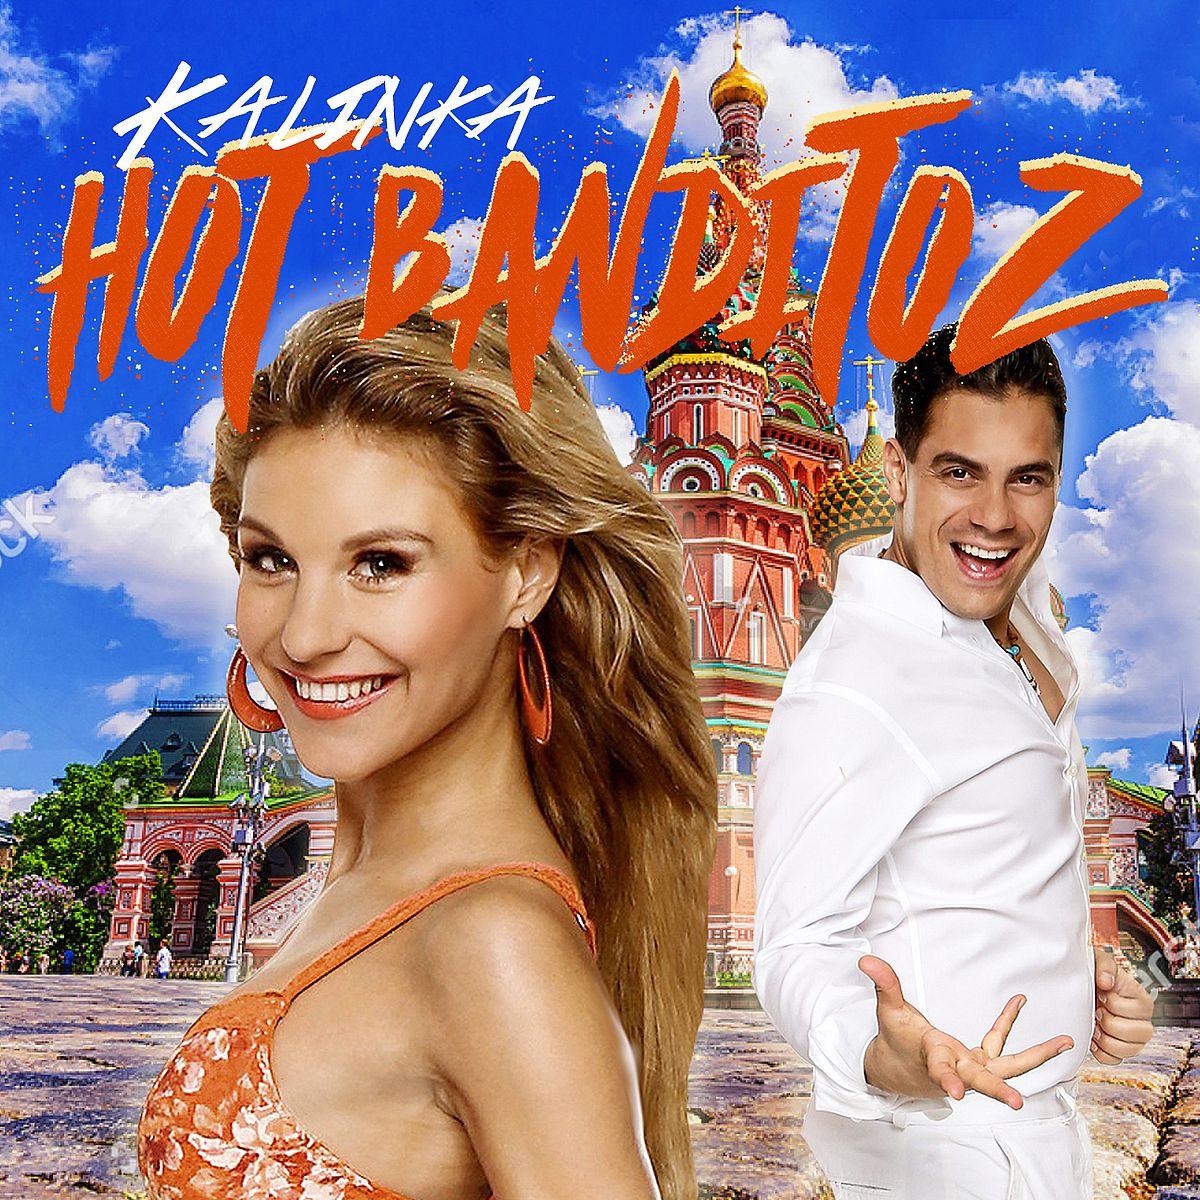 Kalinka, Hot Banditoz